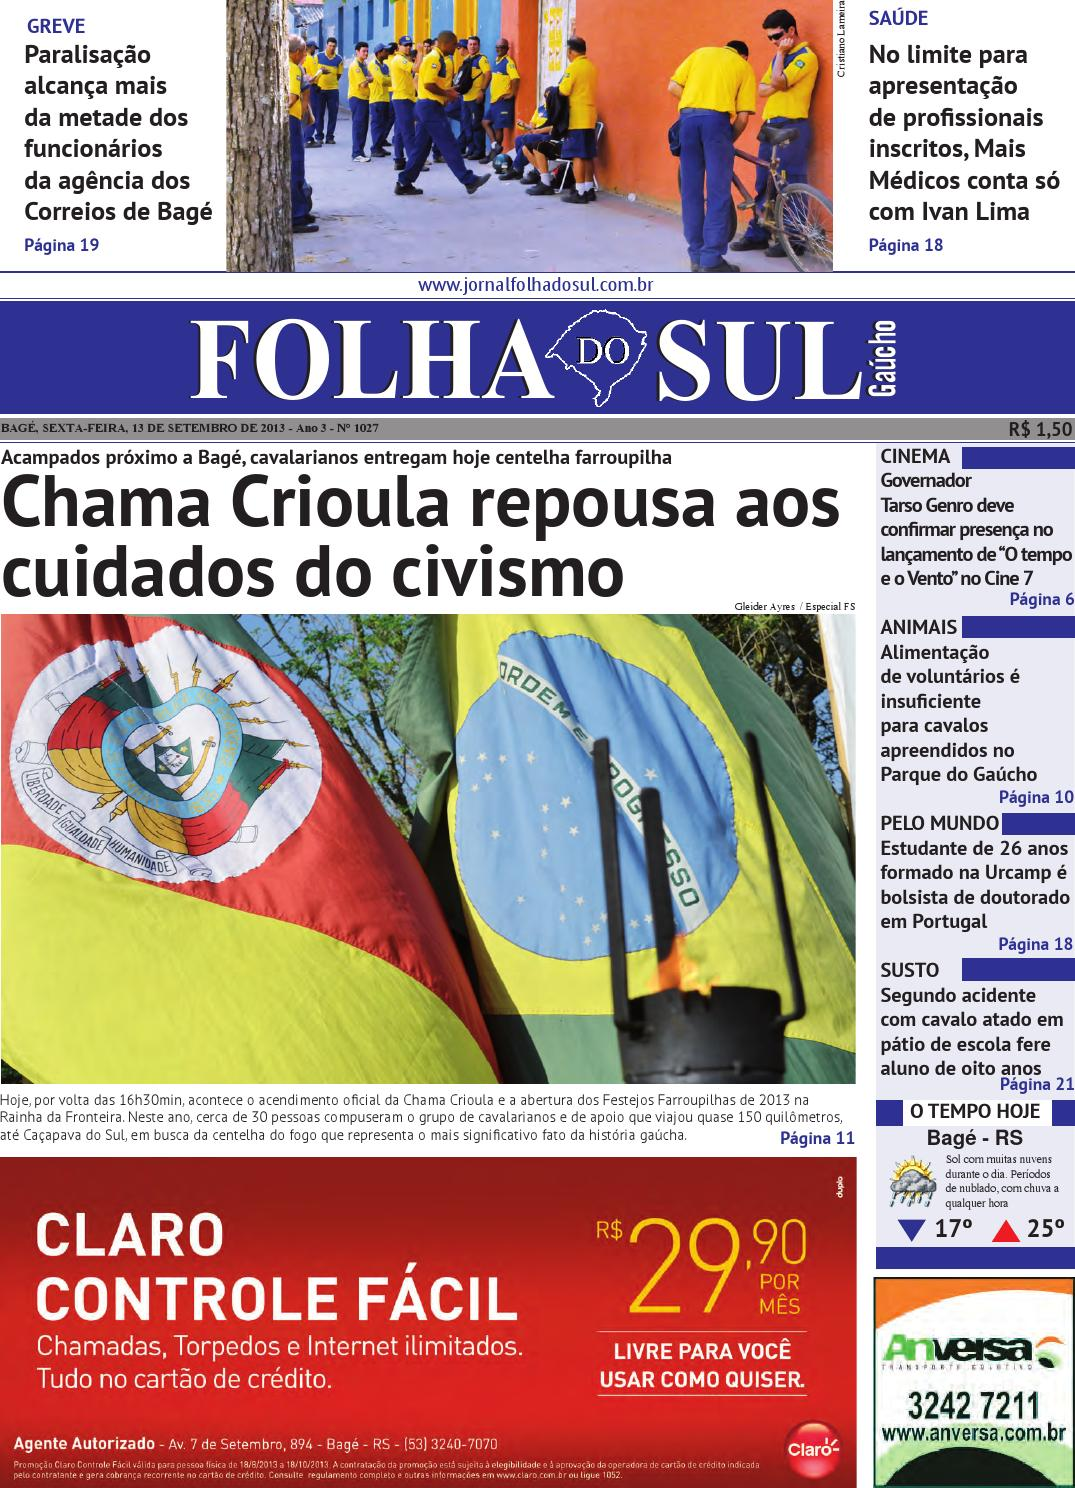 83fb171c9 Folha do Sul Gaúcho Ed. 1027 (13 09 2013) by Folha do Sul Gaúcho - issuu